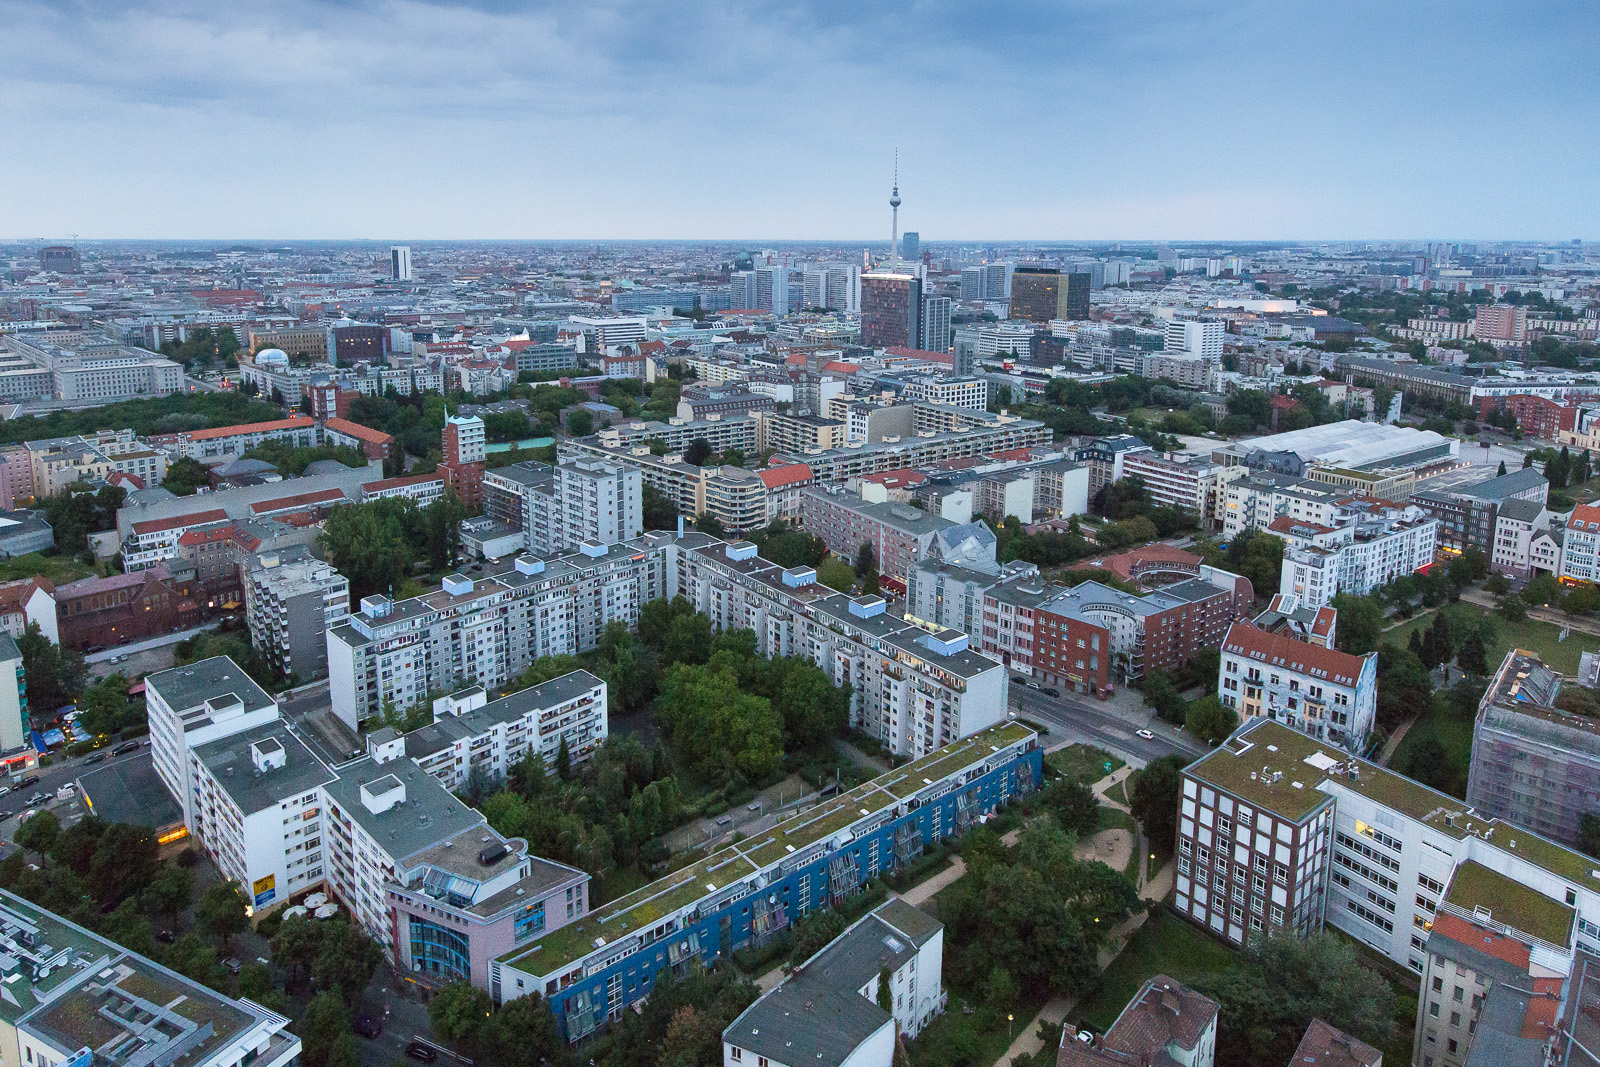 © manuel frauendorf fotografie | skyfilmberlin